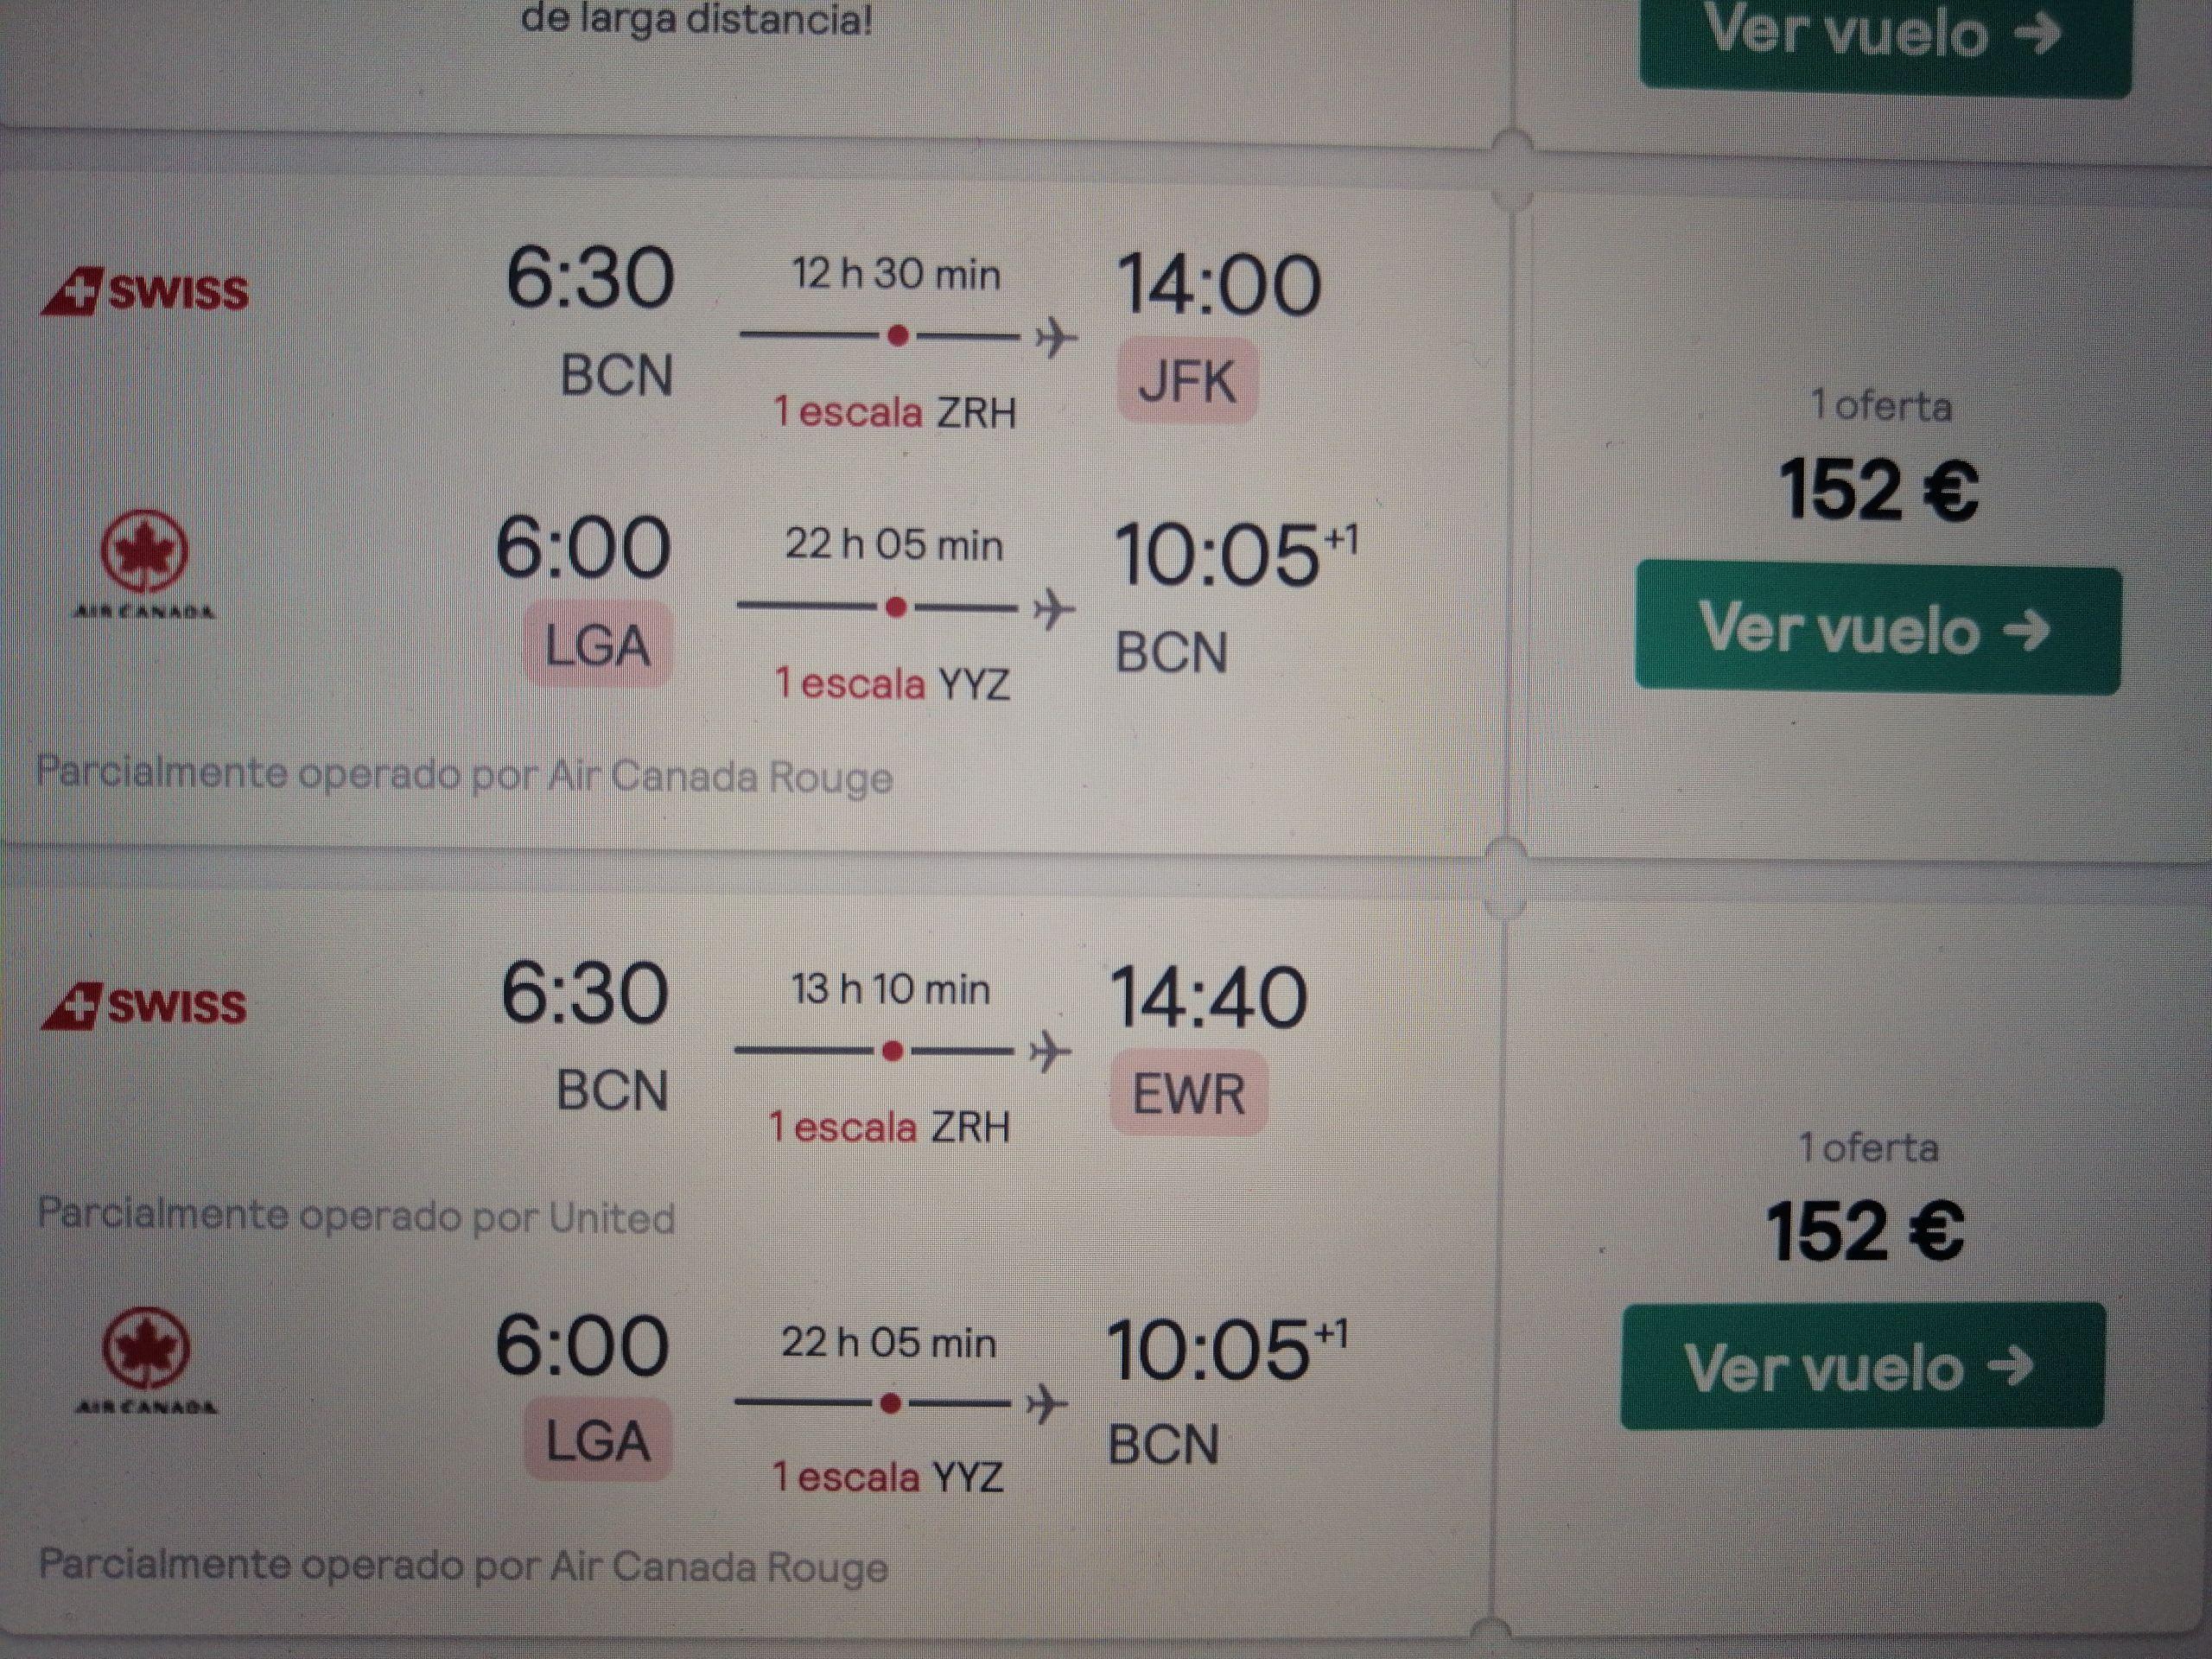 Vuelo Barcelona-Nueva York i/v 150€